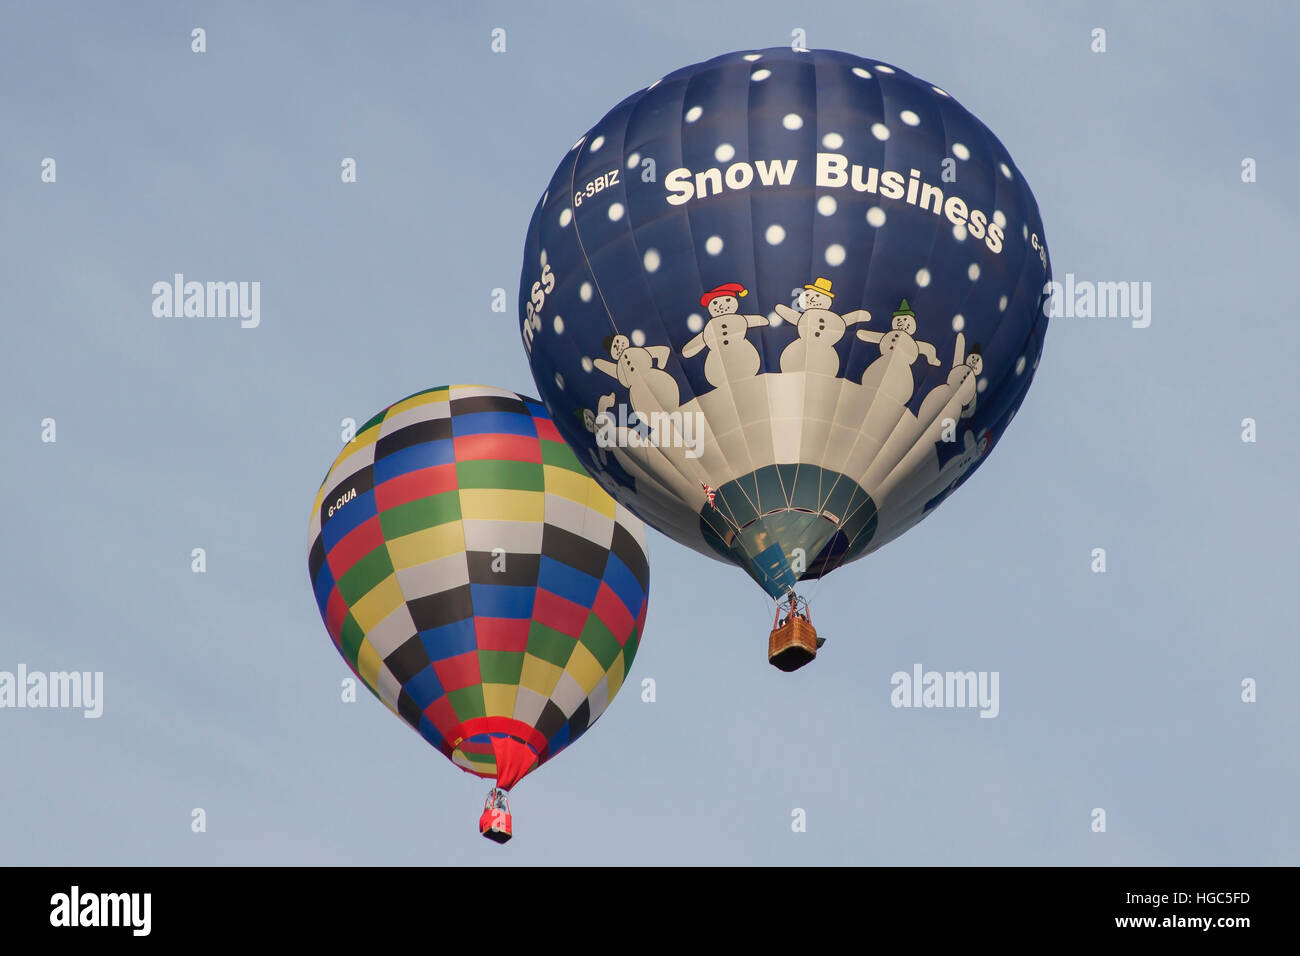 G-SBIZ Cameron Hot Air Balloon of Snow Business at Bristol International Balloon Fiesta 2016 Stock Photo